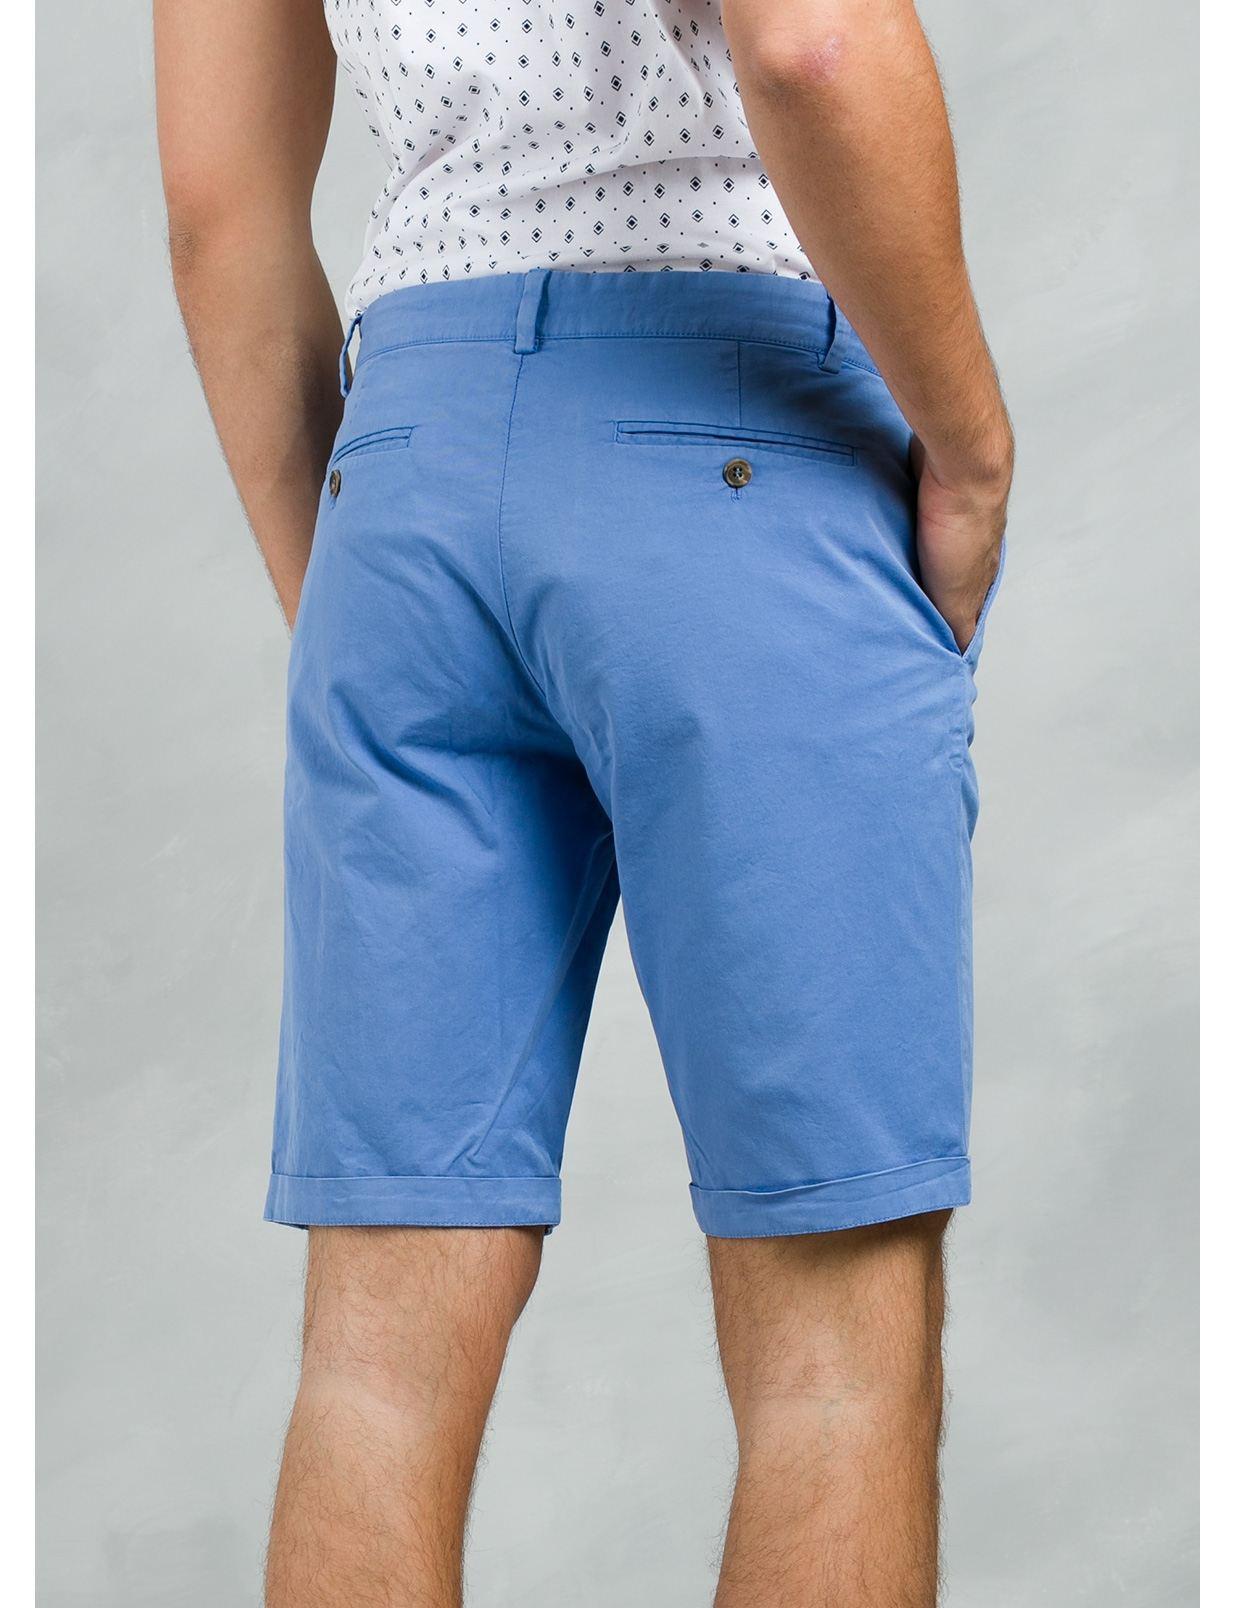 Bermuda ligeramente slim fit color azul, 100% Algodón. - Ítem2